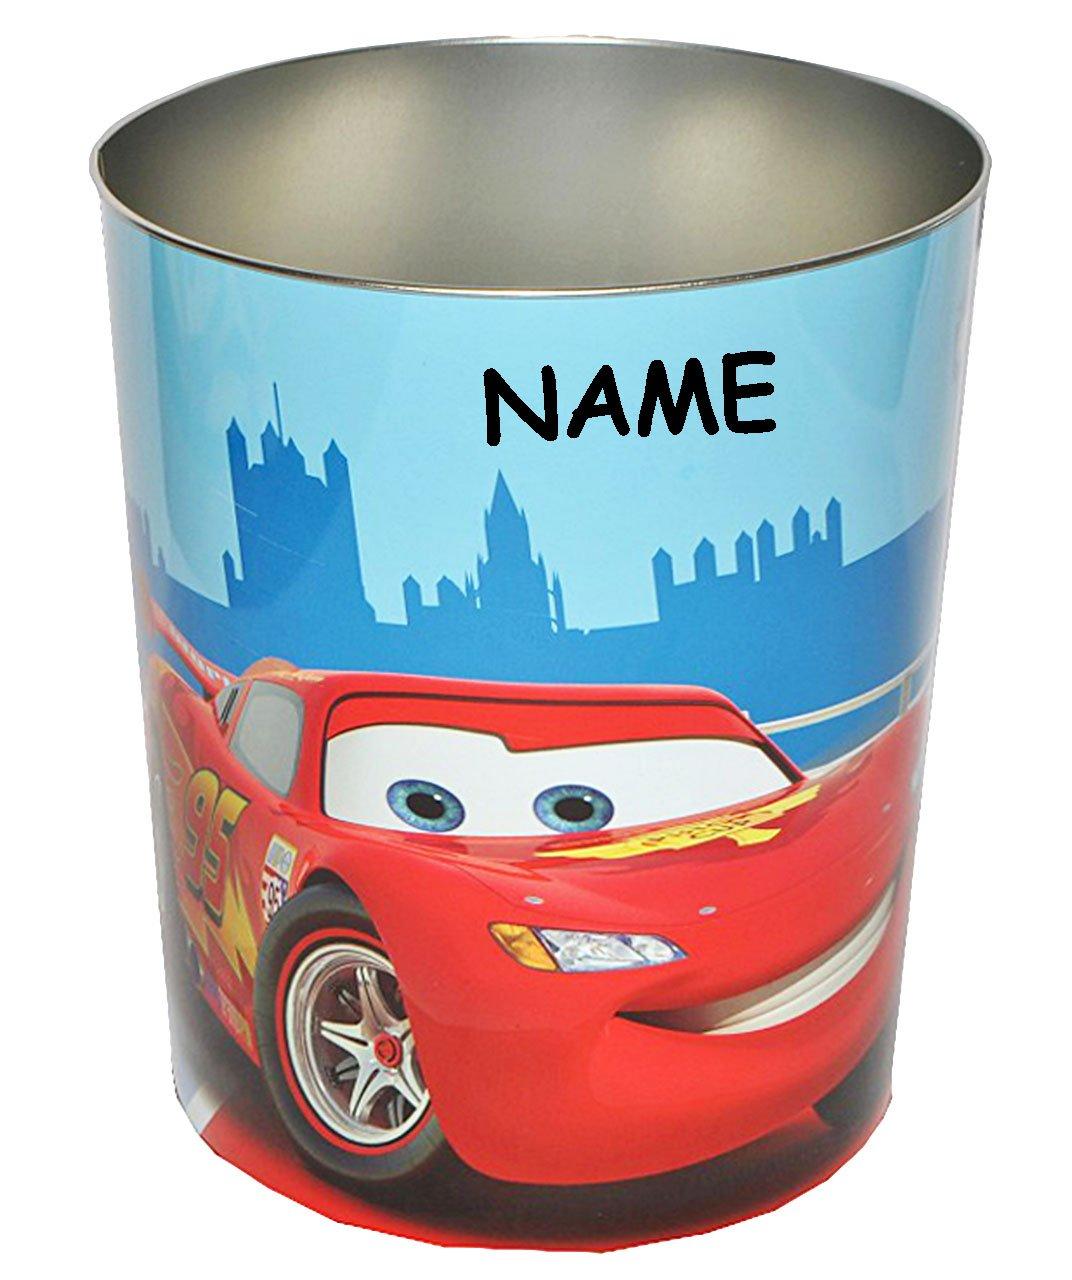 Disney Cars – Lightning McQueen – Papierkorb – incl. Name – Abfallbehälter Kinderzimmer – Auto Mc Queen Hook WGP – Fahrzeuge / stabiler Metall – Mülleimer Eimer – Aufbewahrungsbox für Kinder Jungen günstig kaufen